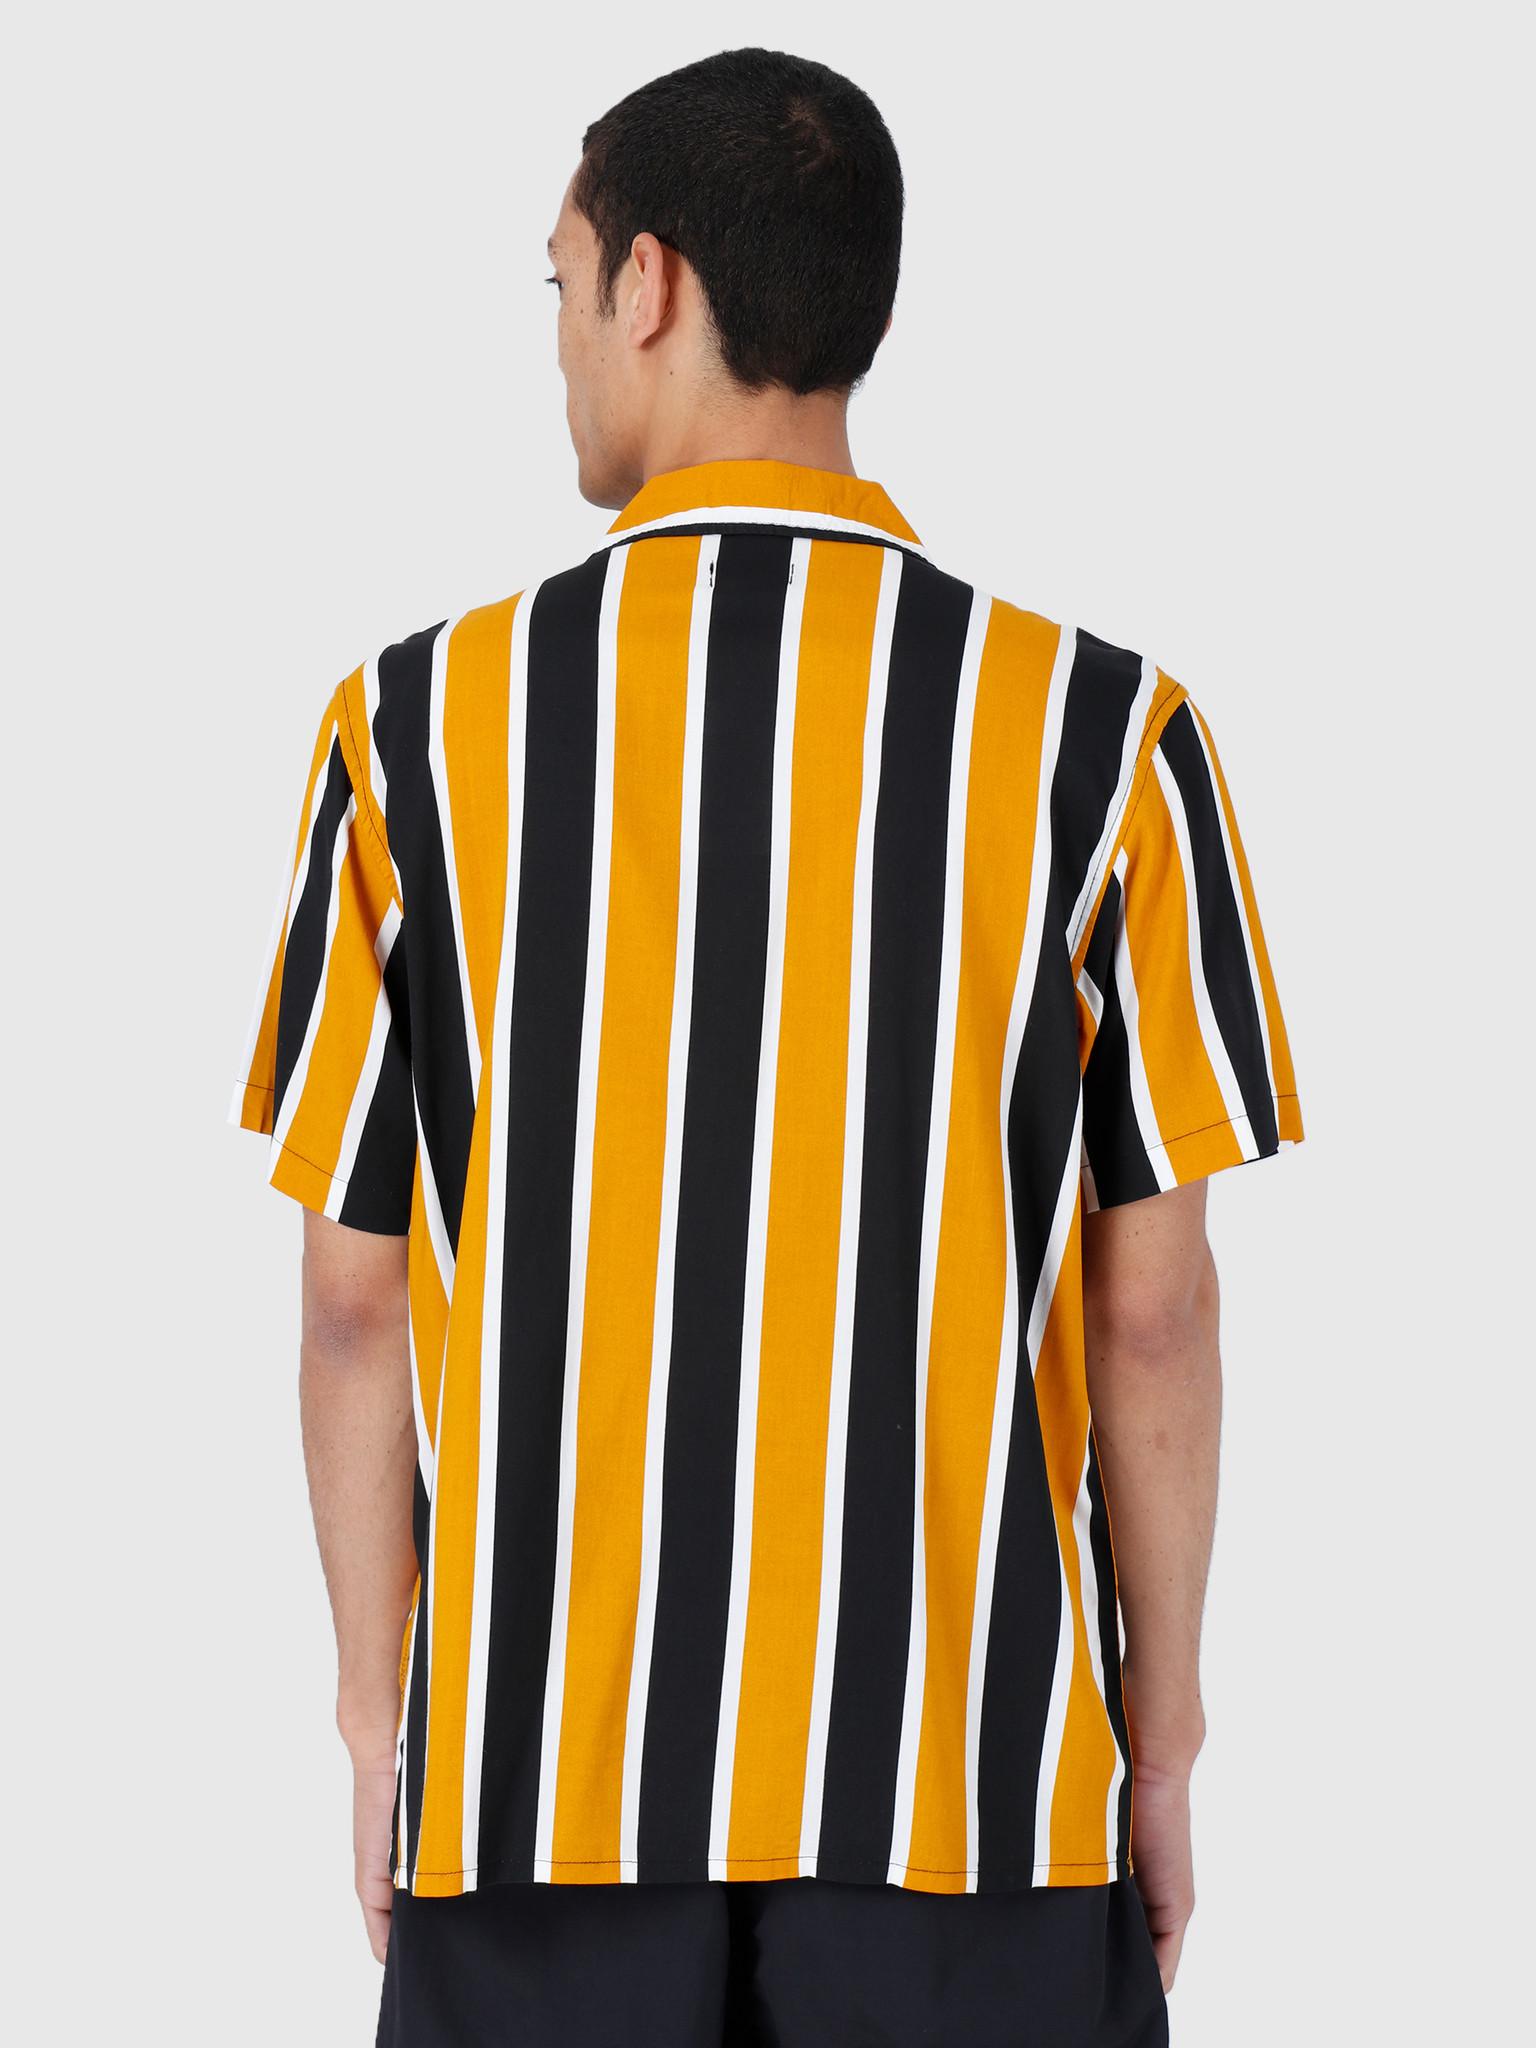 Obey Obey Sutter Stripe Woven T-Shirt Mineral Yellow Multi 181210245-MRL